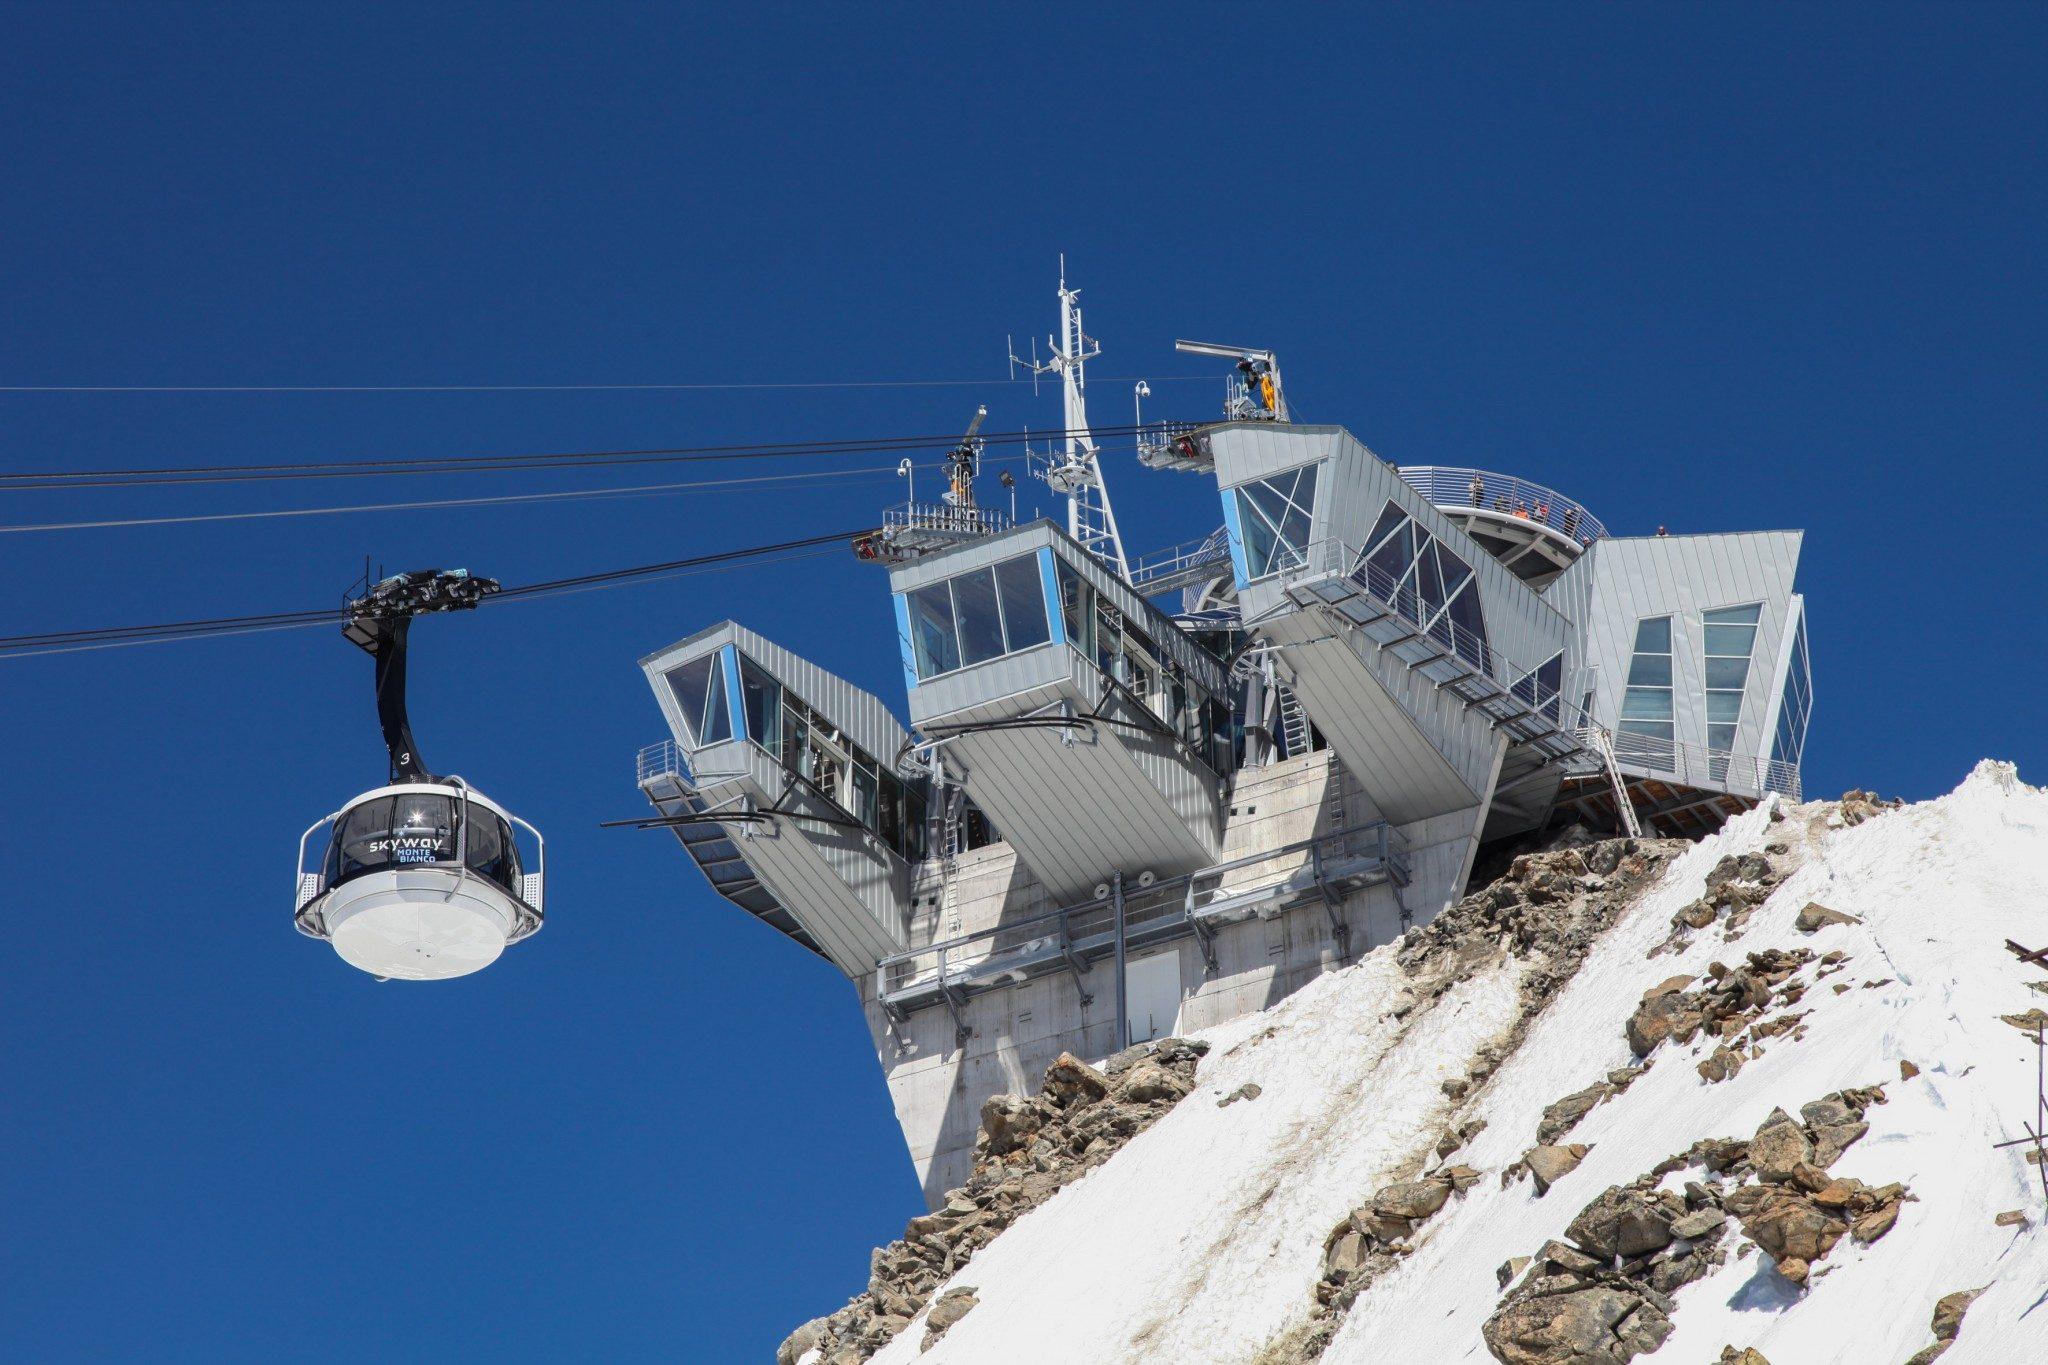 Funivie mont blanc courmayeur italy webcam